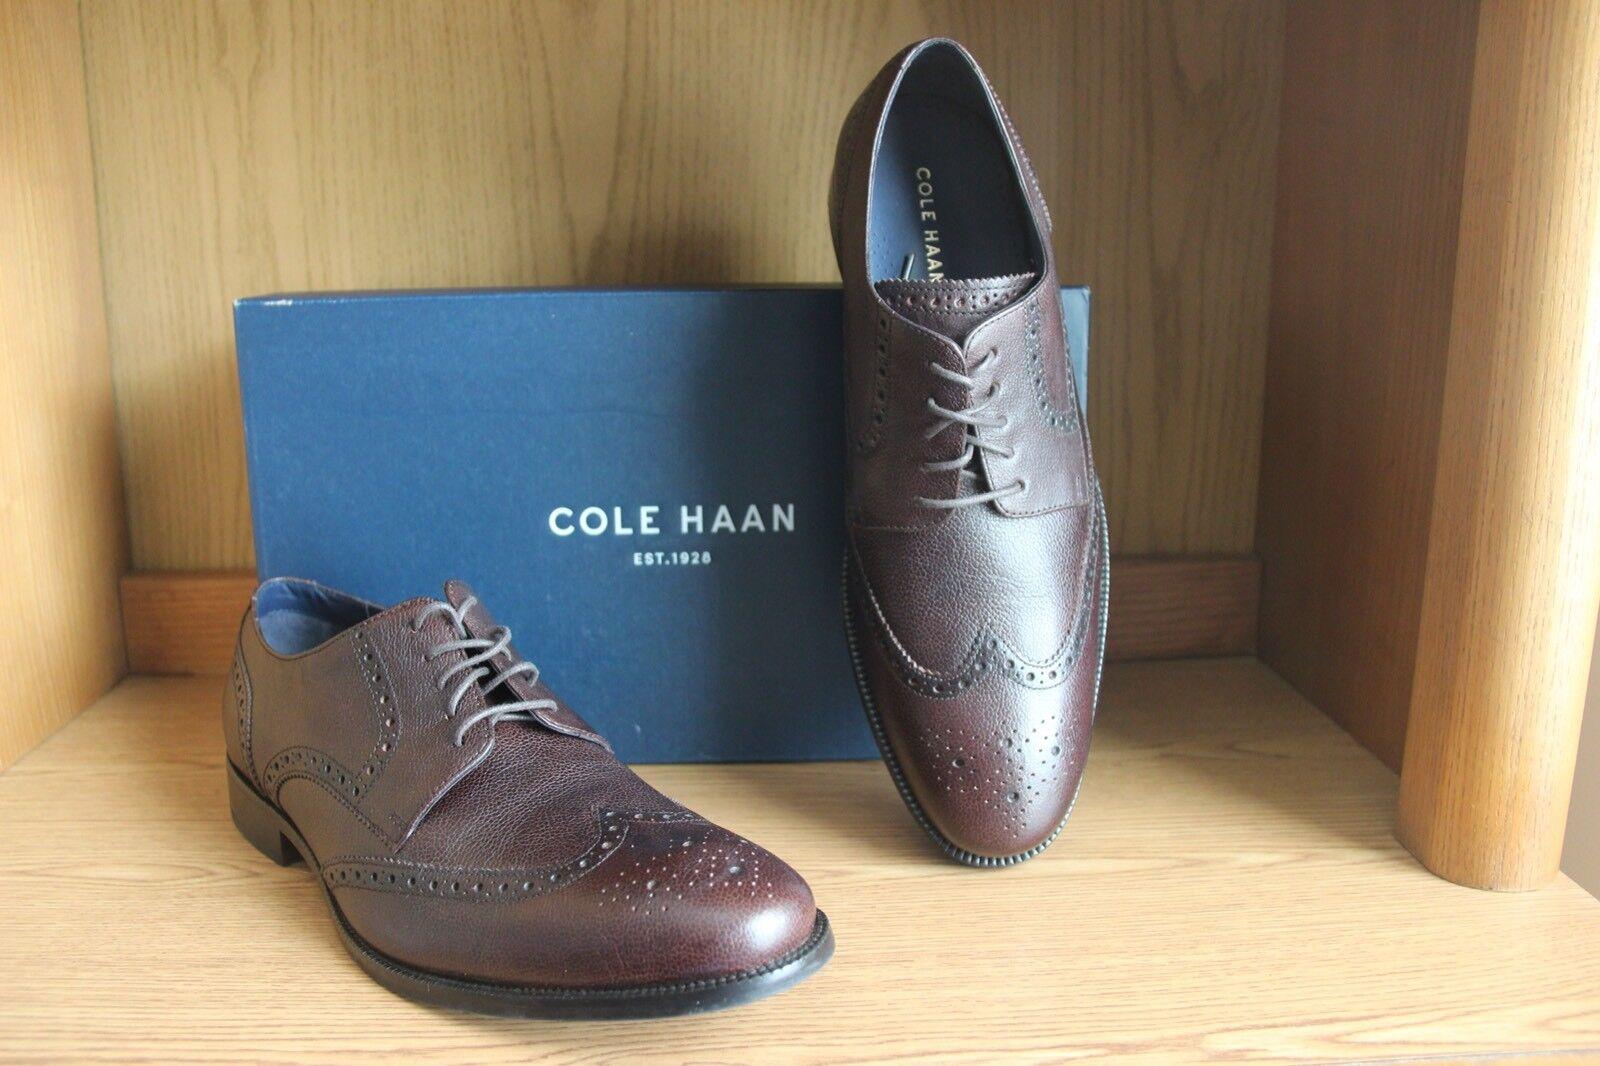 Cole Haan Benton Wingtip Oxford II shoes Mahogany Brown Men Size 11.5 C25623